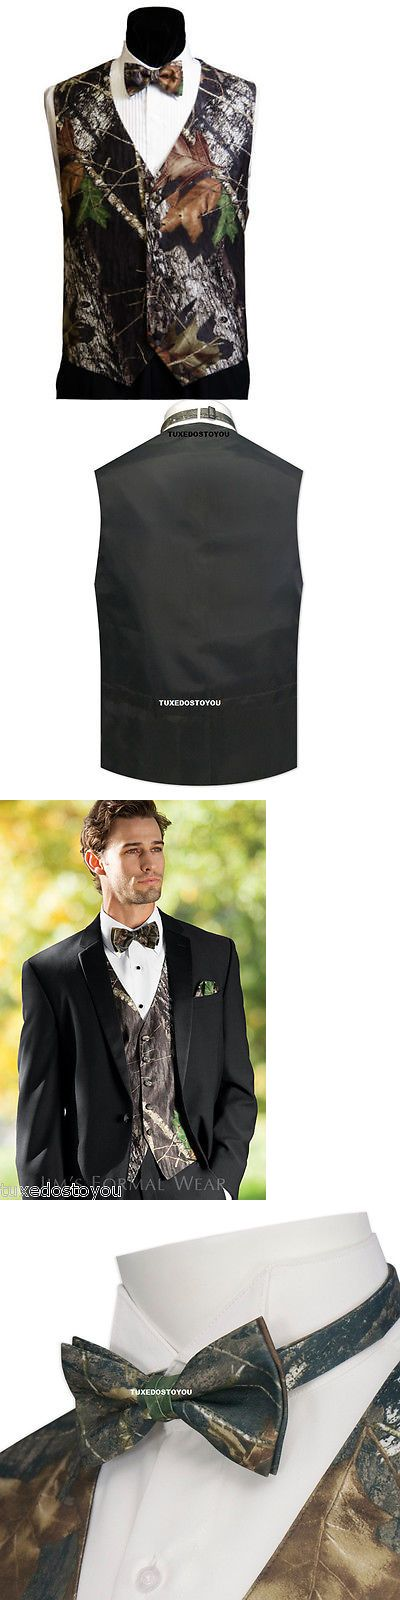 Tuxedo and Formal Vests 105514: Xxxl 3Xl New Mossy Oak Camo Tuxedo Vest Bow Tie Tux Camouflage Duck Dynasty -> BUY IT NOW ONLY: $67.95 on eBay!